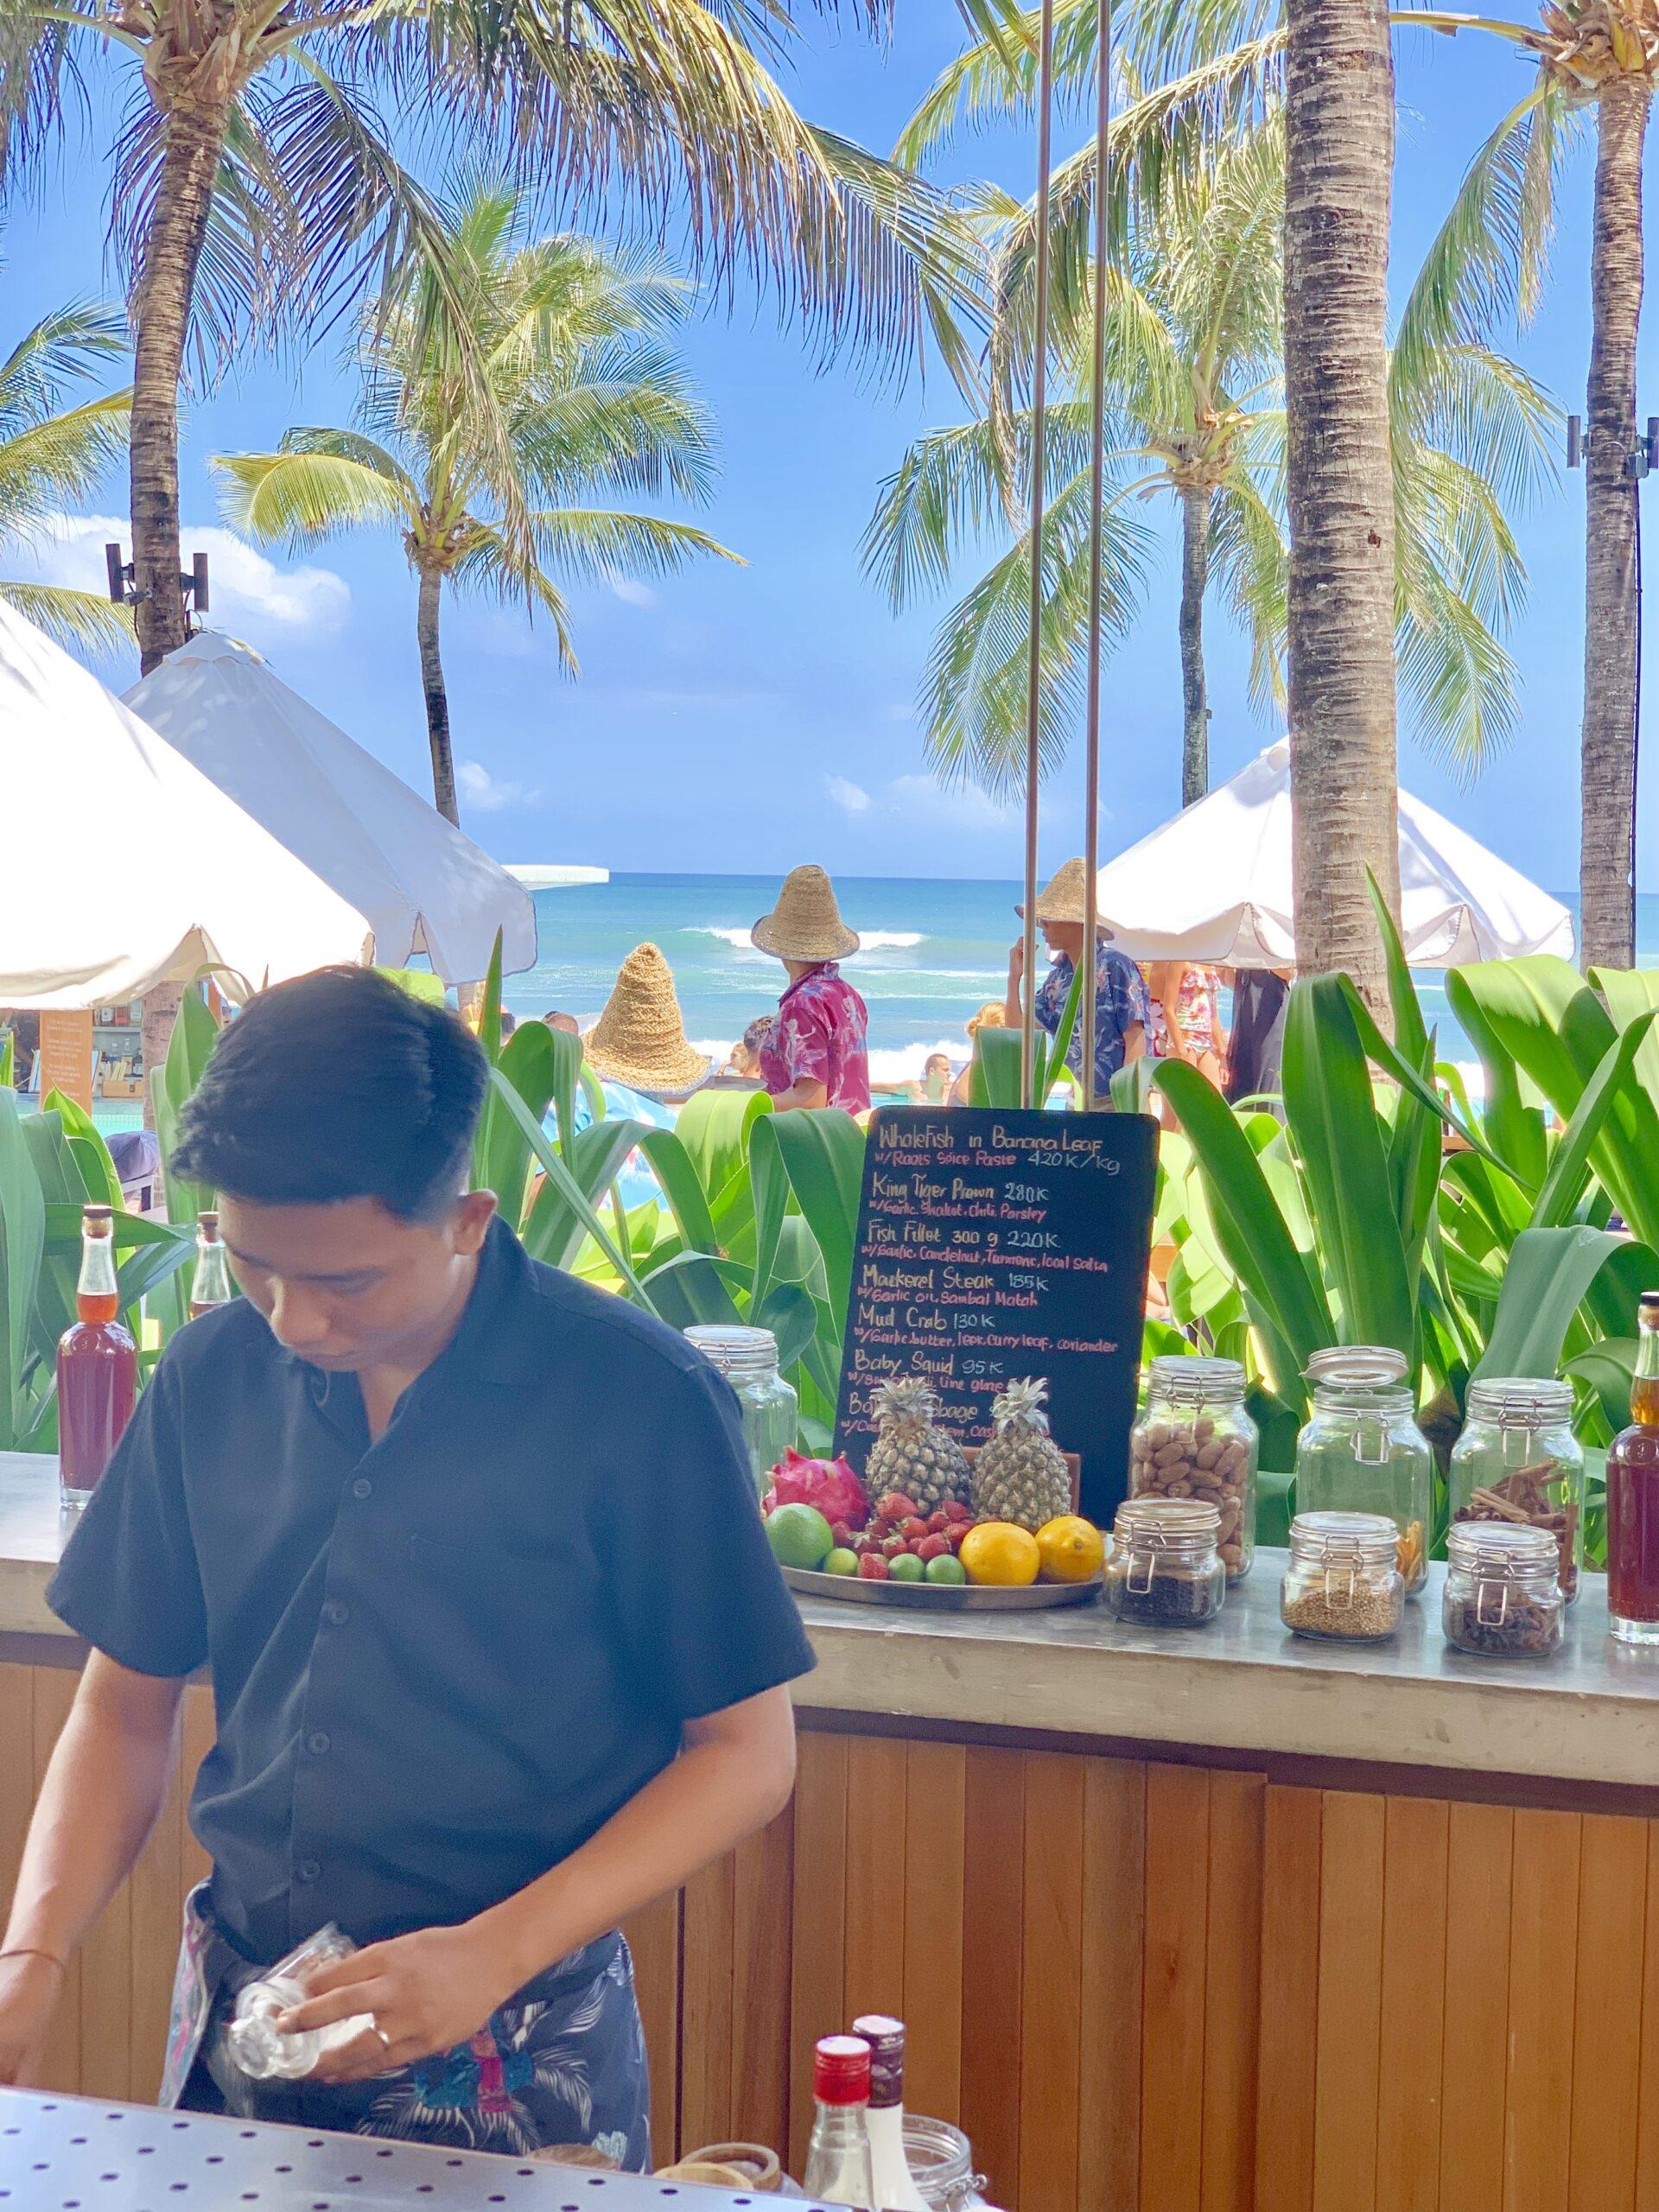 Trendy Vibes på Bali!